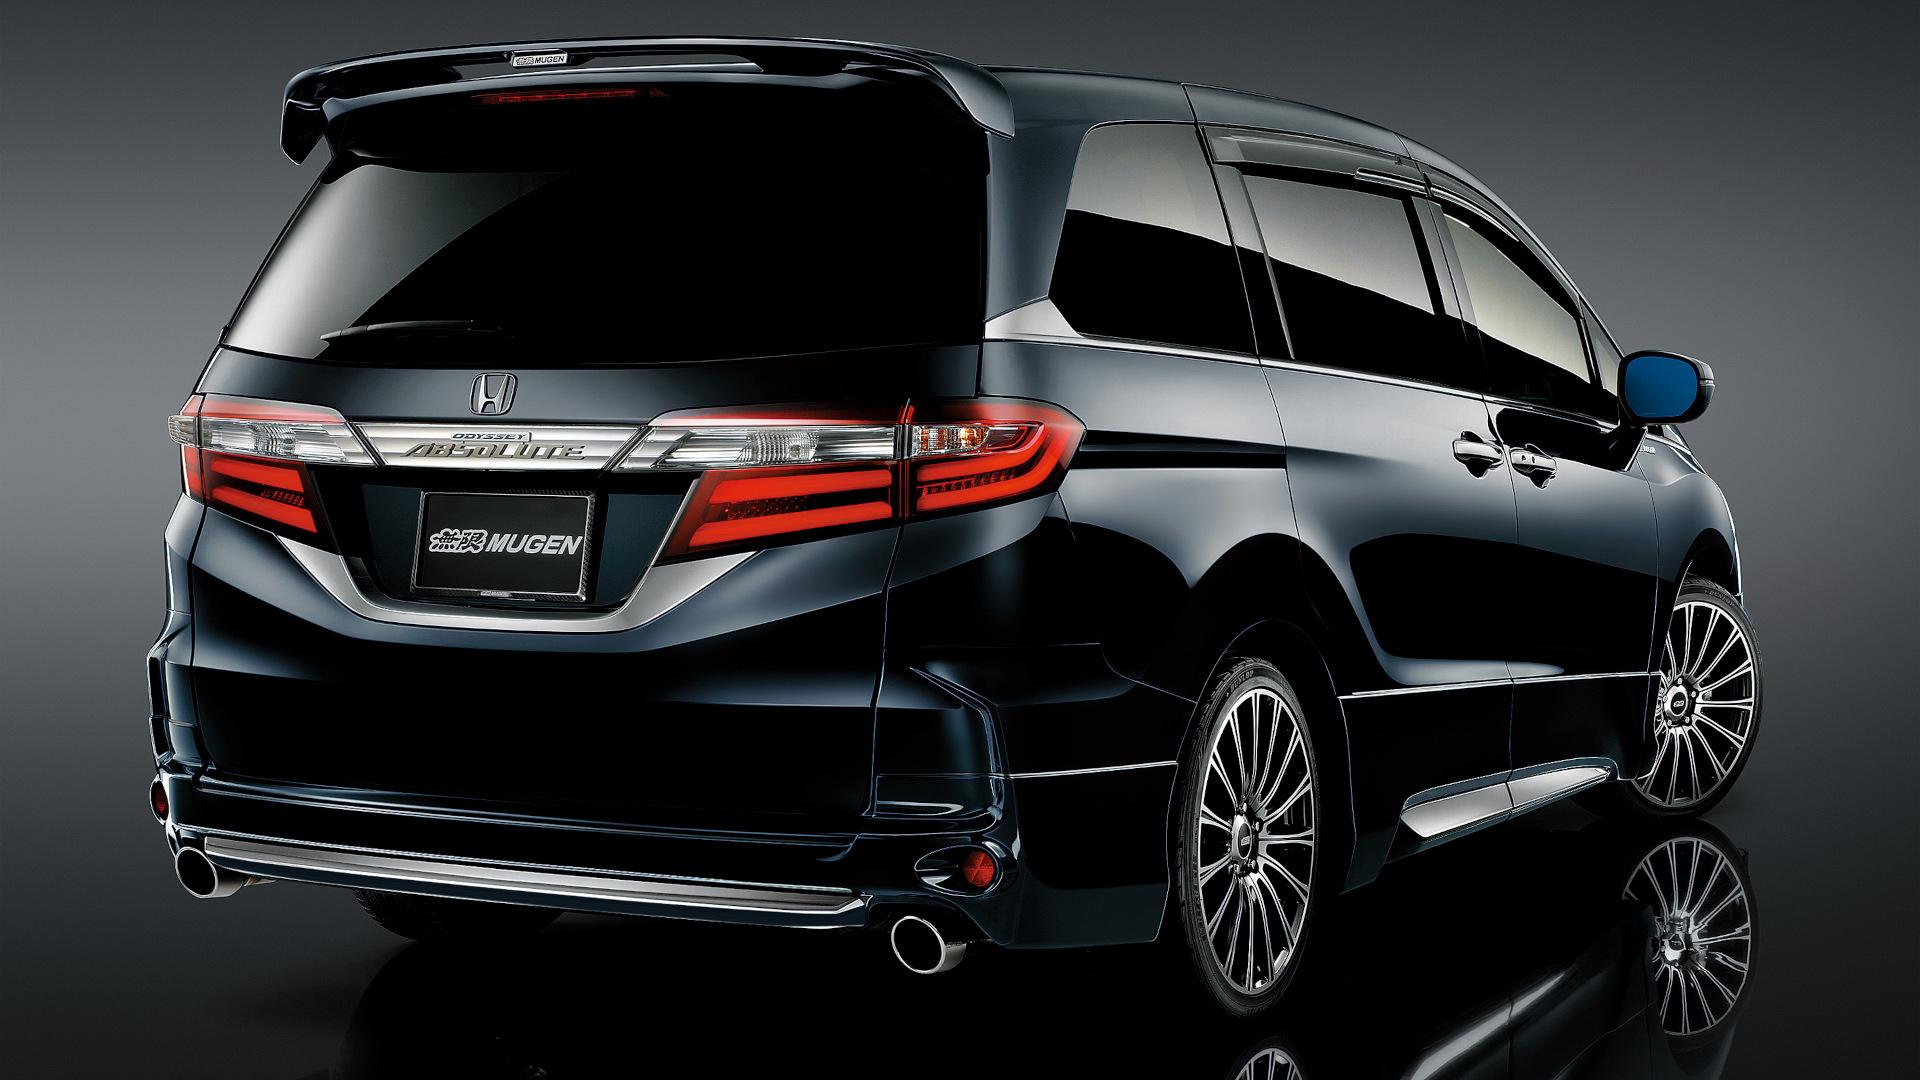 The Honda Odyssey with Mugen Kits - Black, Rear Angle